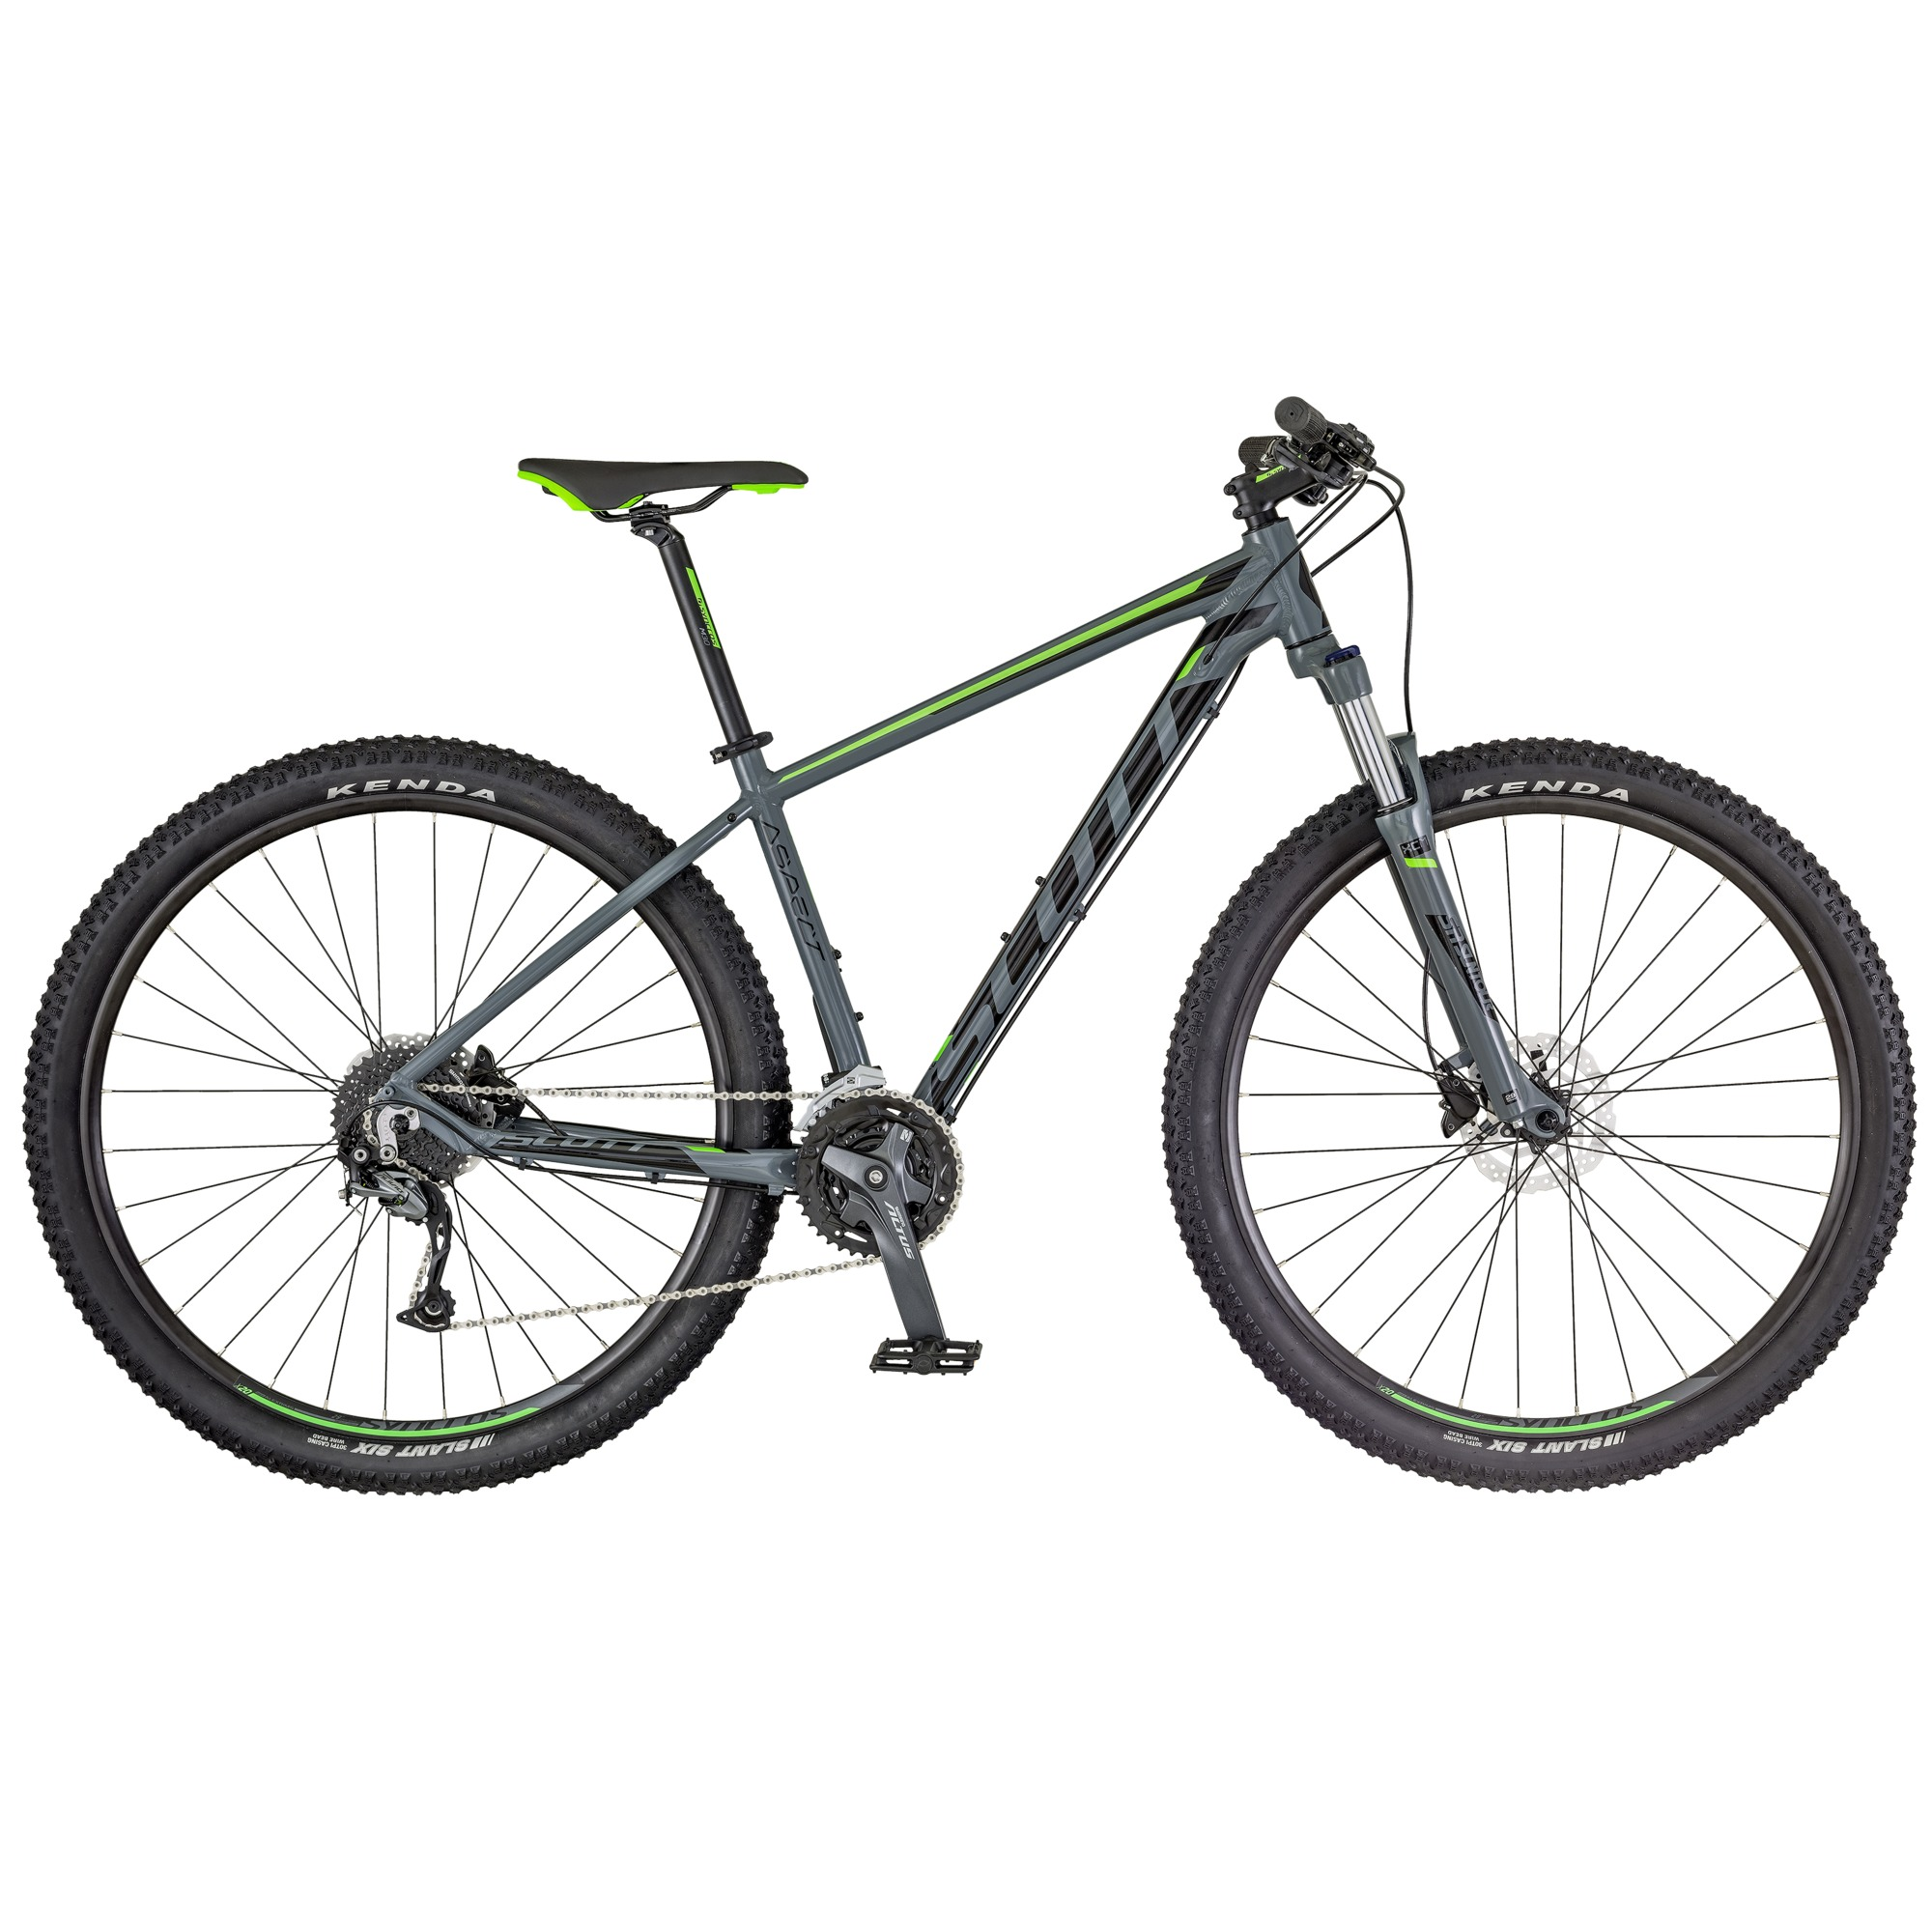 SCOTT Aspect 740 Bike grau/grün XL - Zweirad Homann